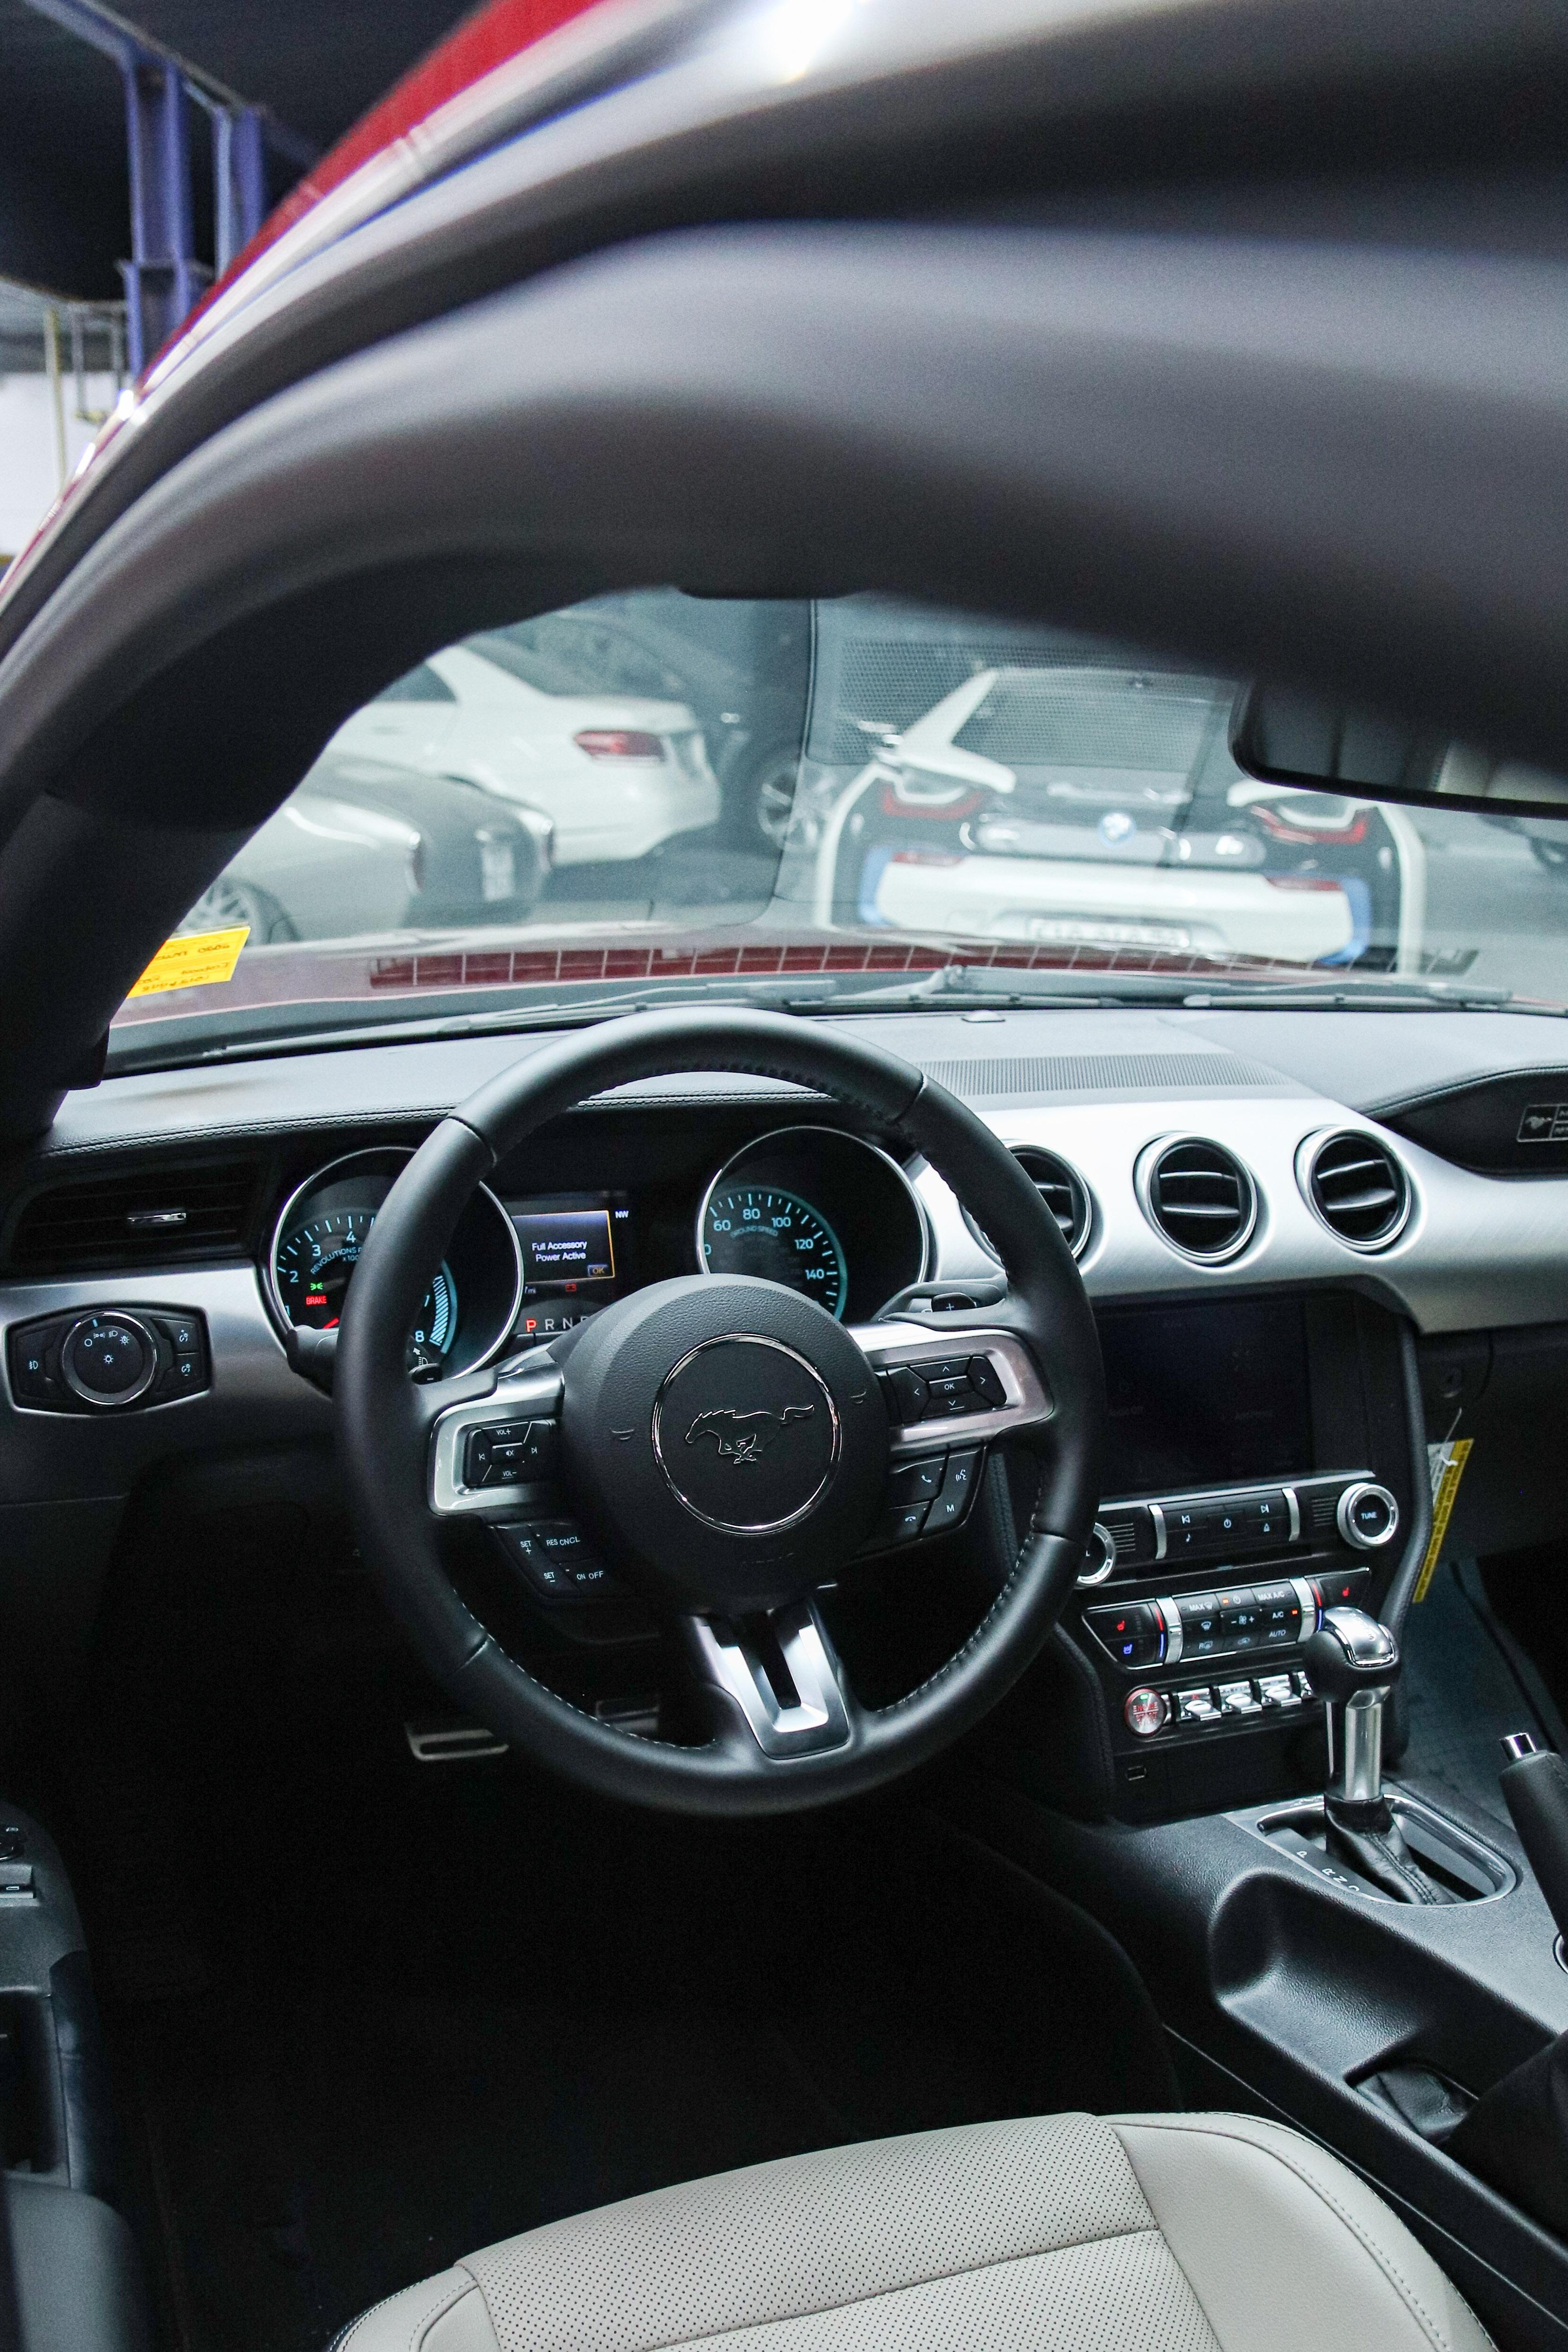 Ford Mustang 2020 phien ban ky niem vua ve VN, gia hon 3 ty hinh anh 38 Mustang_55_edition_zing_132__1.jpg